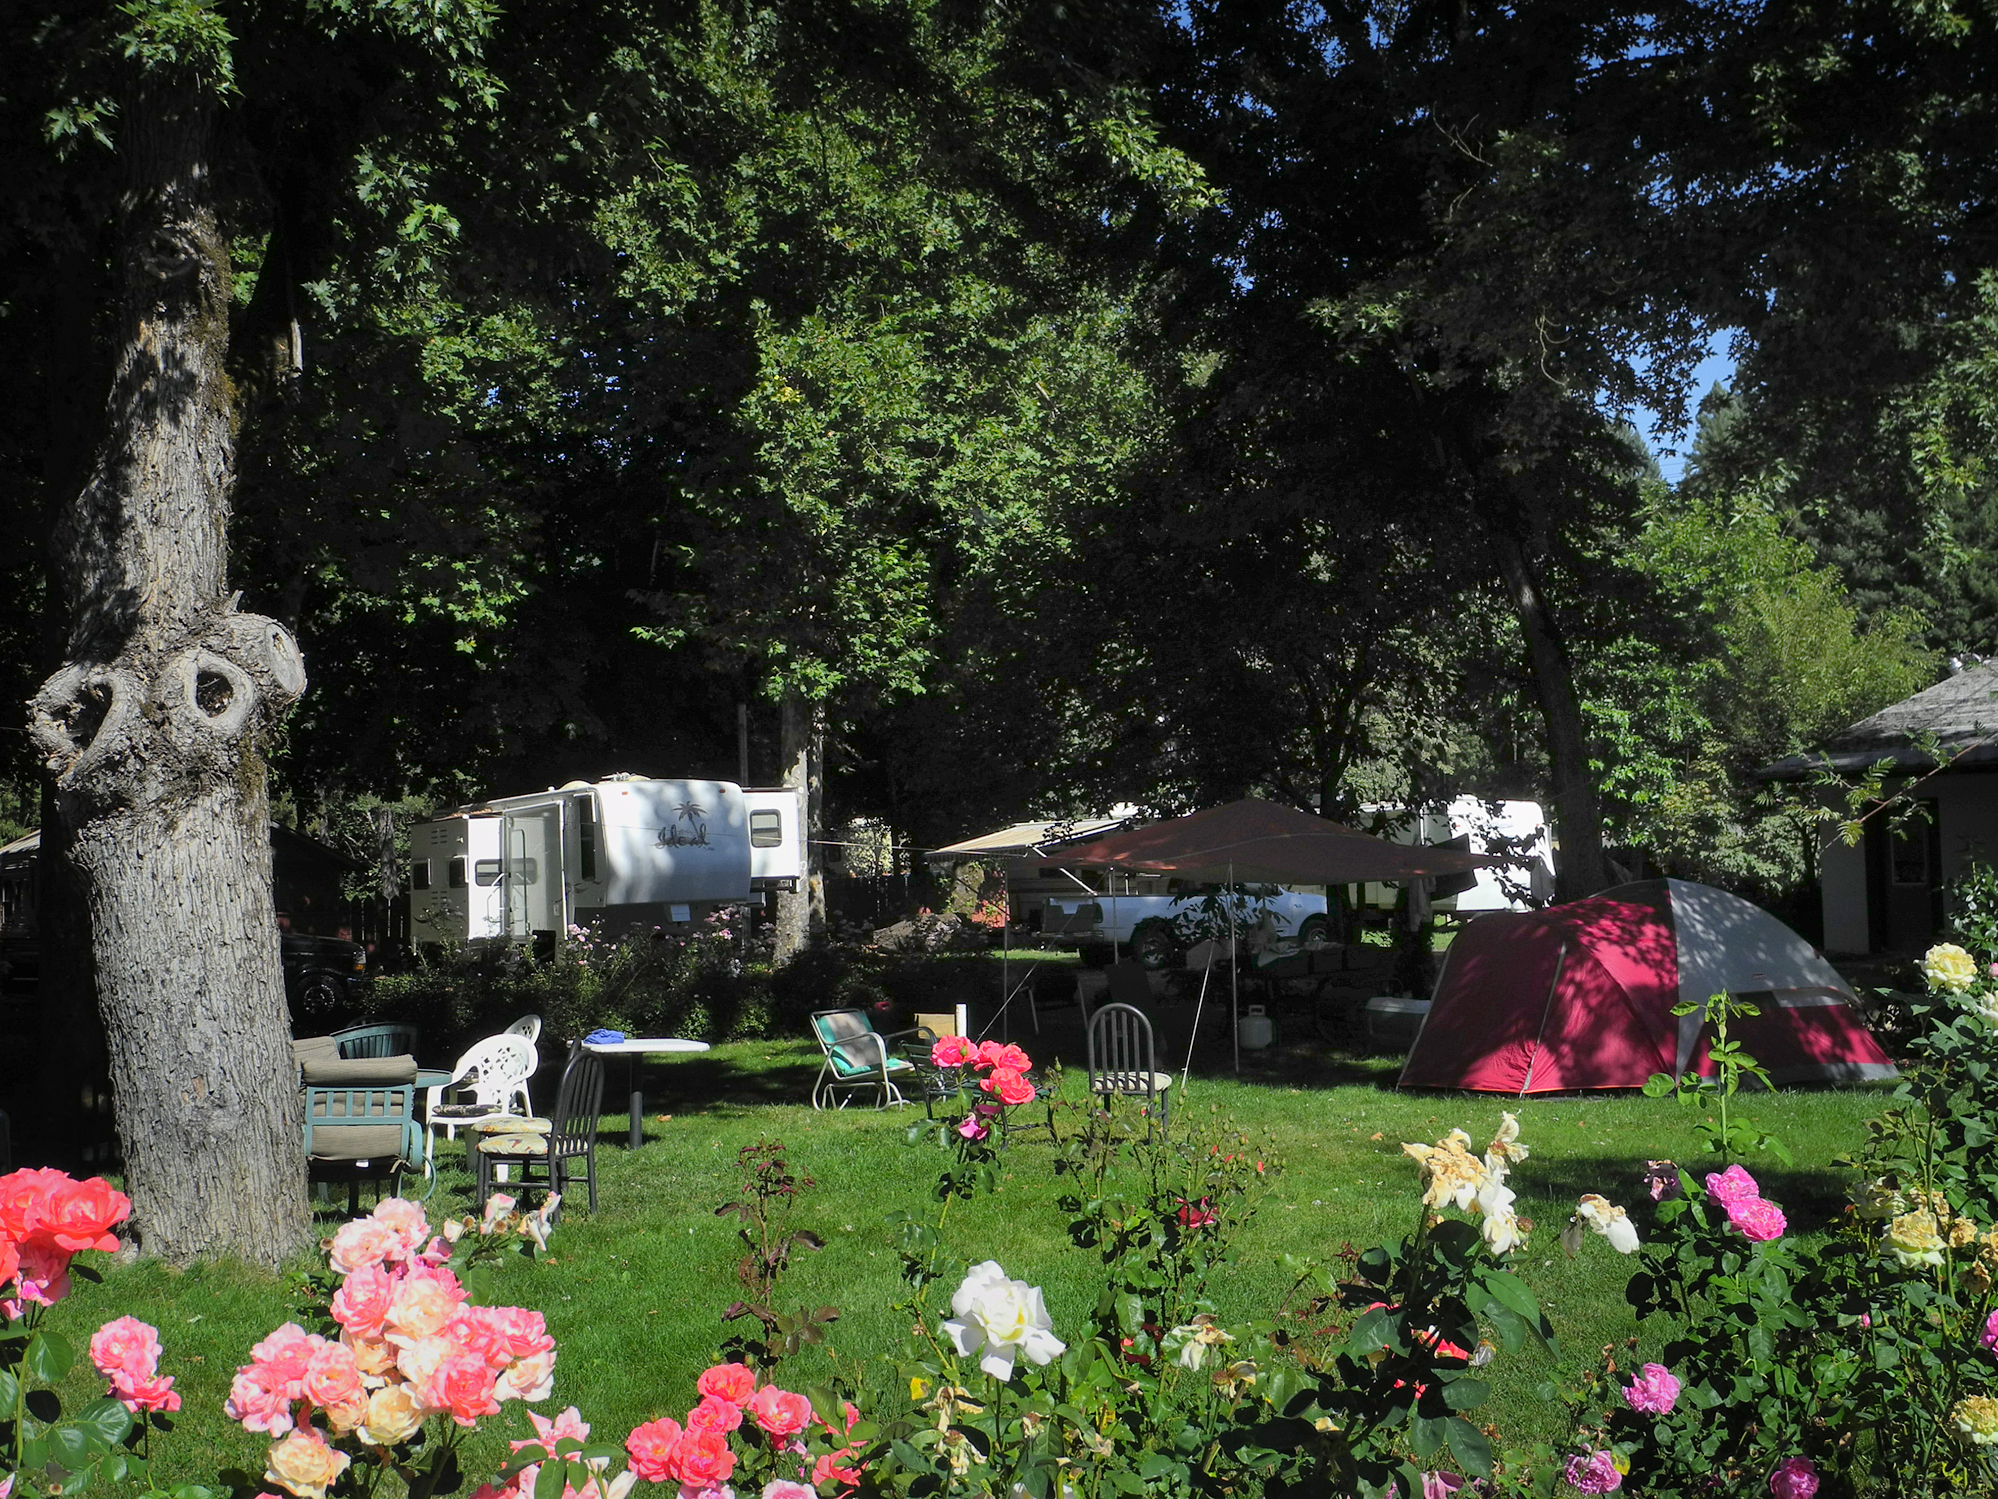 RV #3 Tent